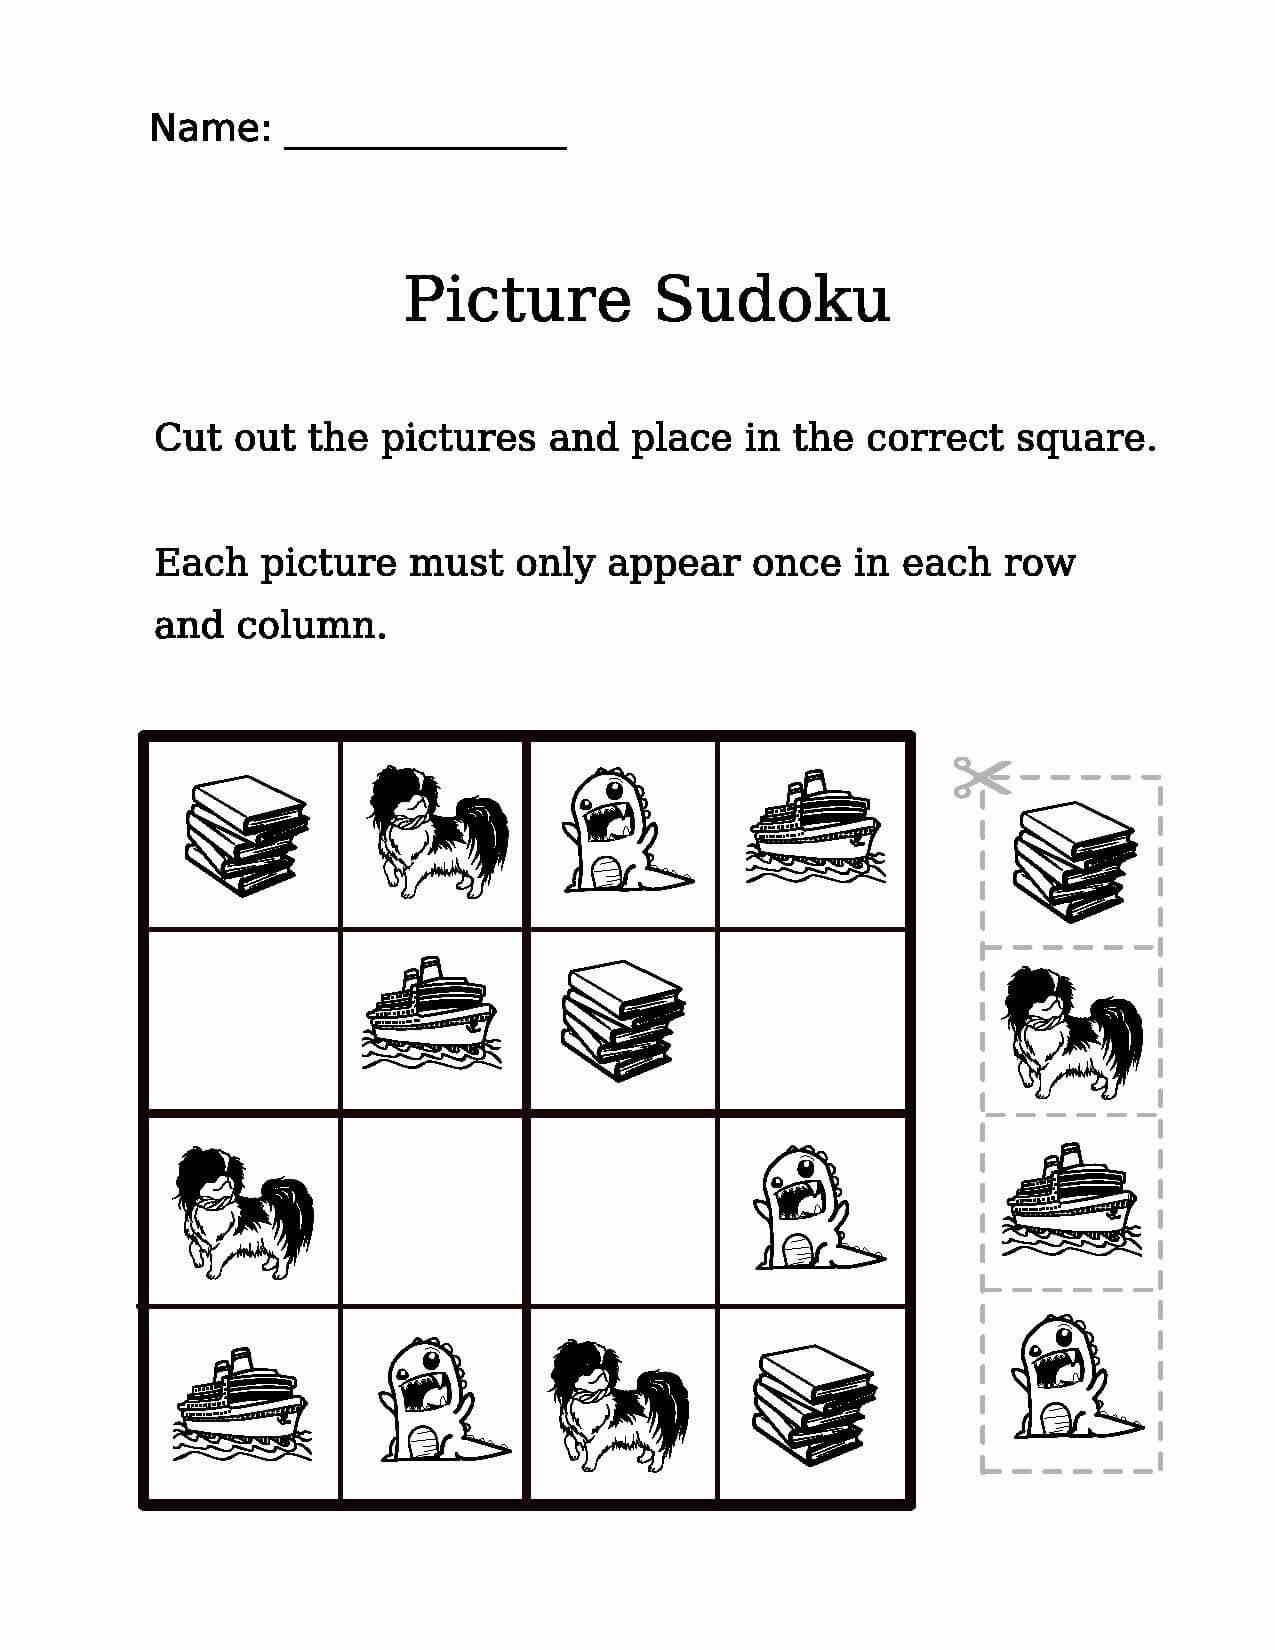 Picture Sudoku Worksheet